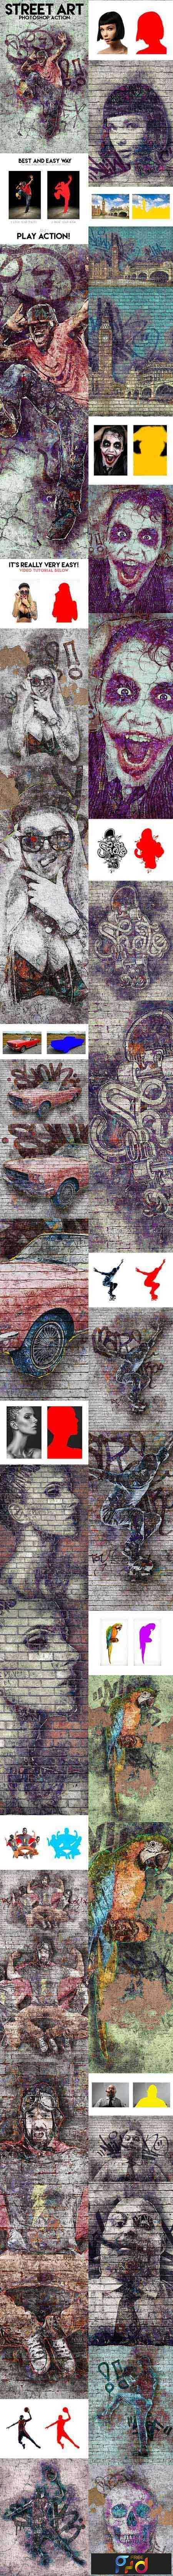 1804197 Street Art Photoshop Action 15970551 1